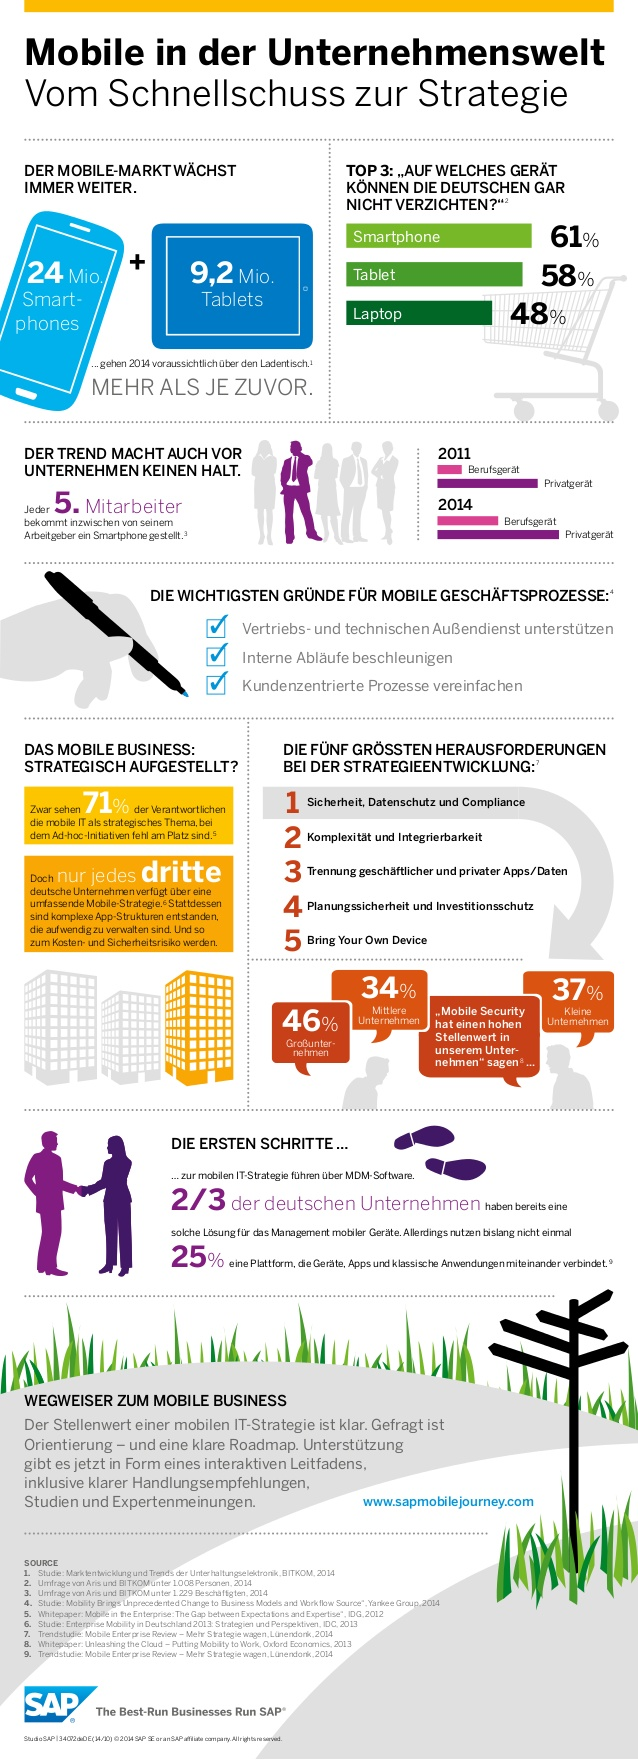 SAP-mobile-strategie-in-unternehmen-infografik